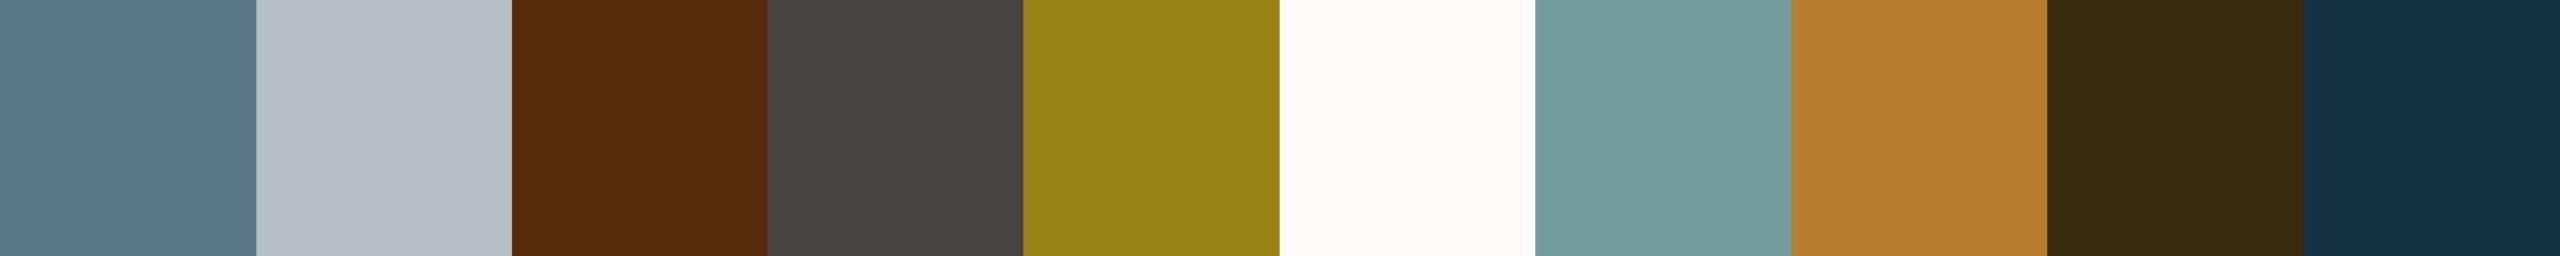 128 Vebula Color Palette